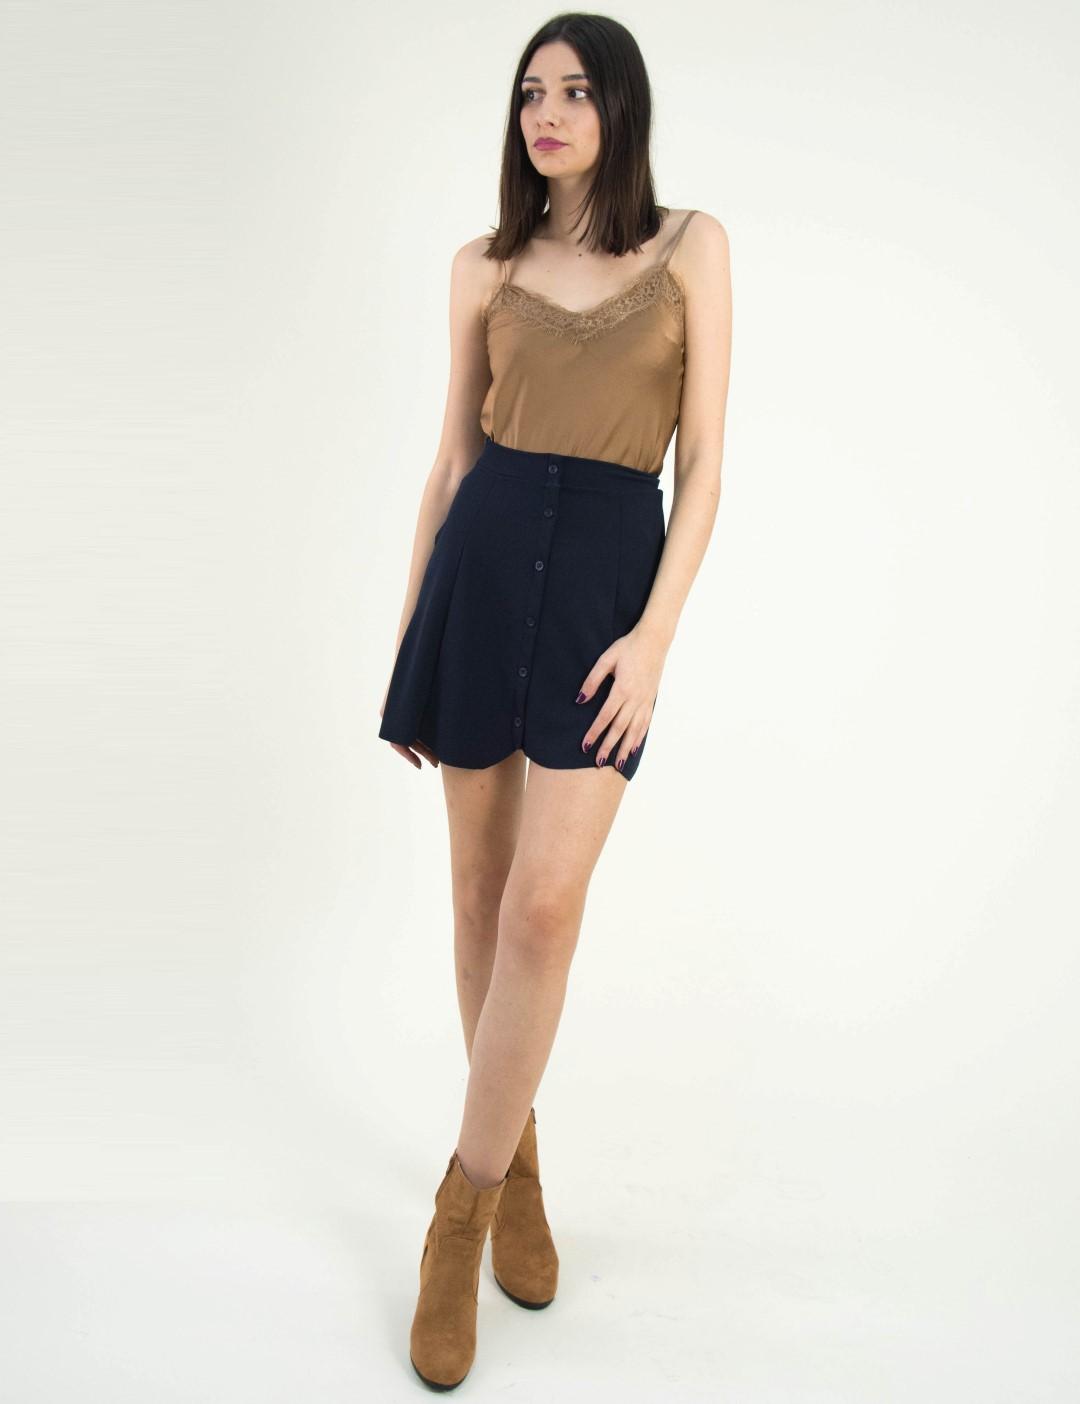 e0b4df1be63d Γυναικεία μίνι υφασμάτινη φούστα So Sexy μπλε με κουμπά 12620